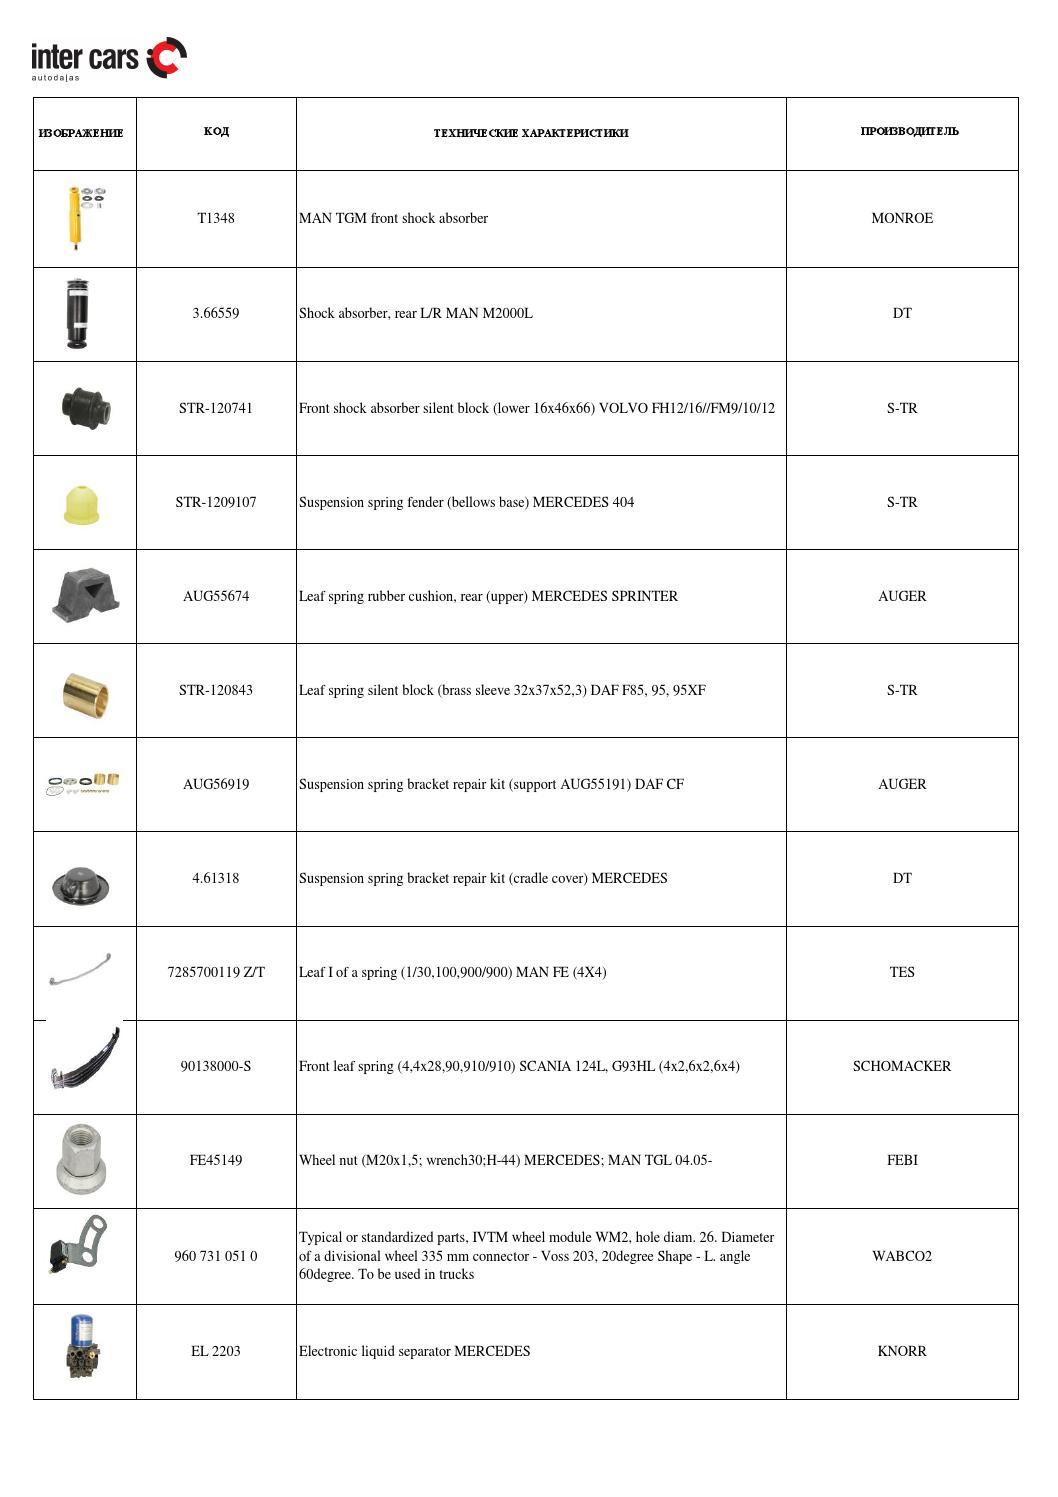 fiat ducato fuse box diagram wiring library fiat ducato dashboard symbols full hd pictures 4k ultra full box symbols mean daf